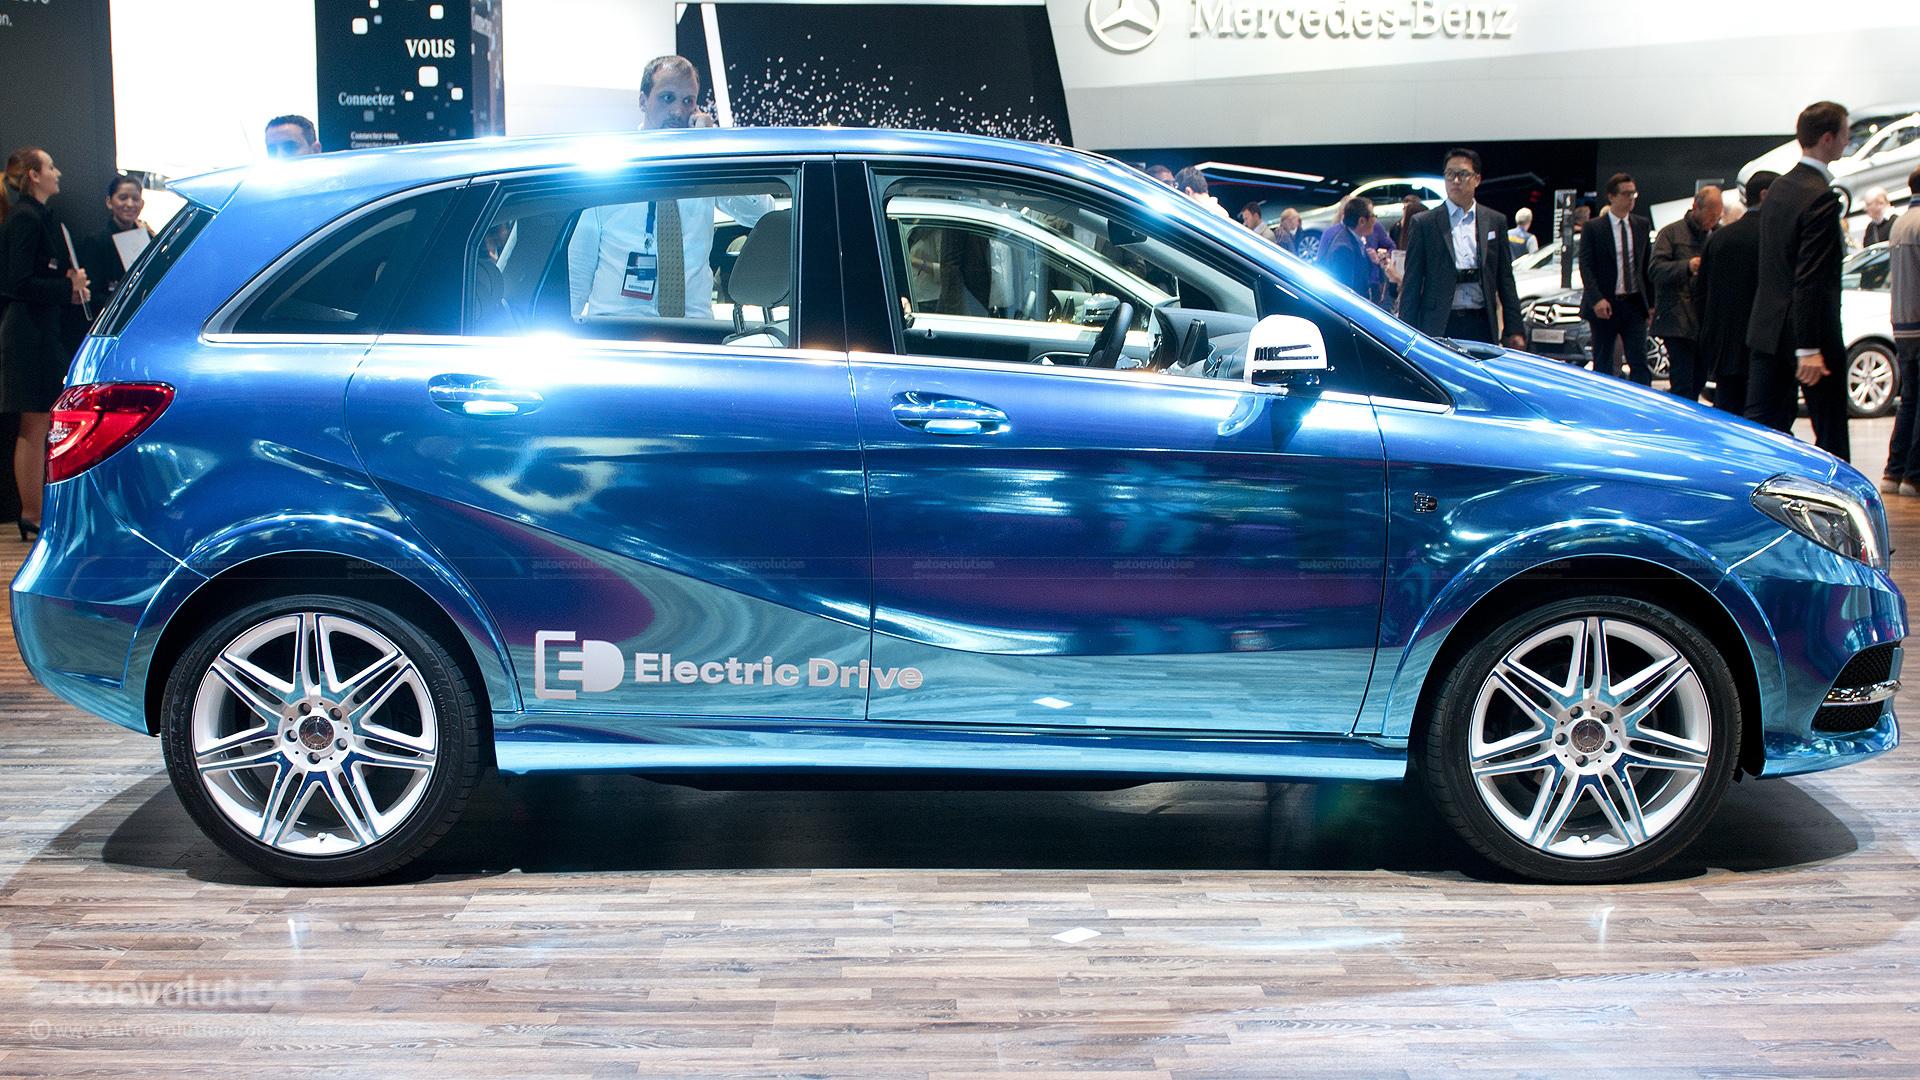 Paris 2012 mercedes benz b class electric drive live for Mercedes benz b class electric car